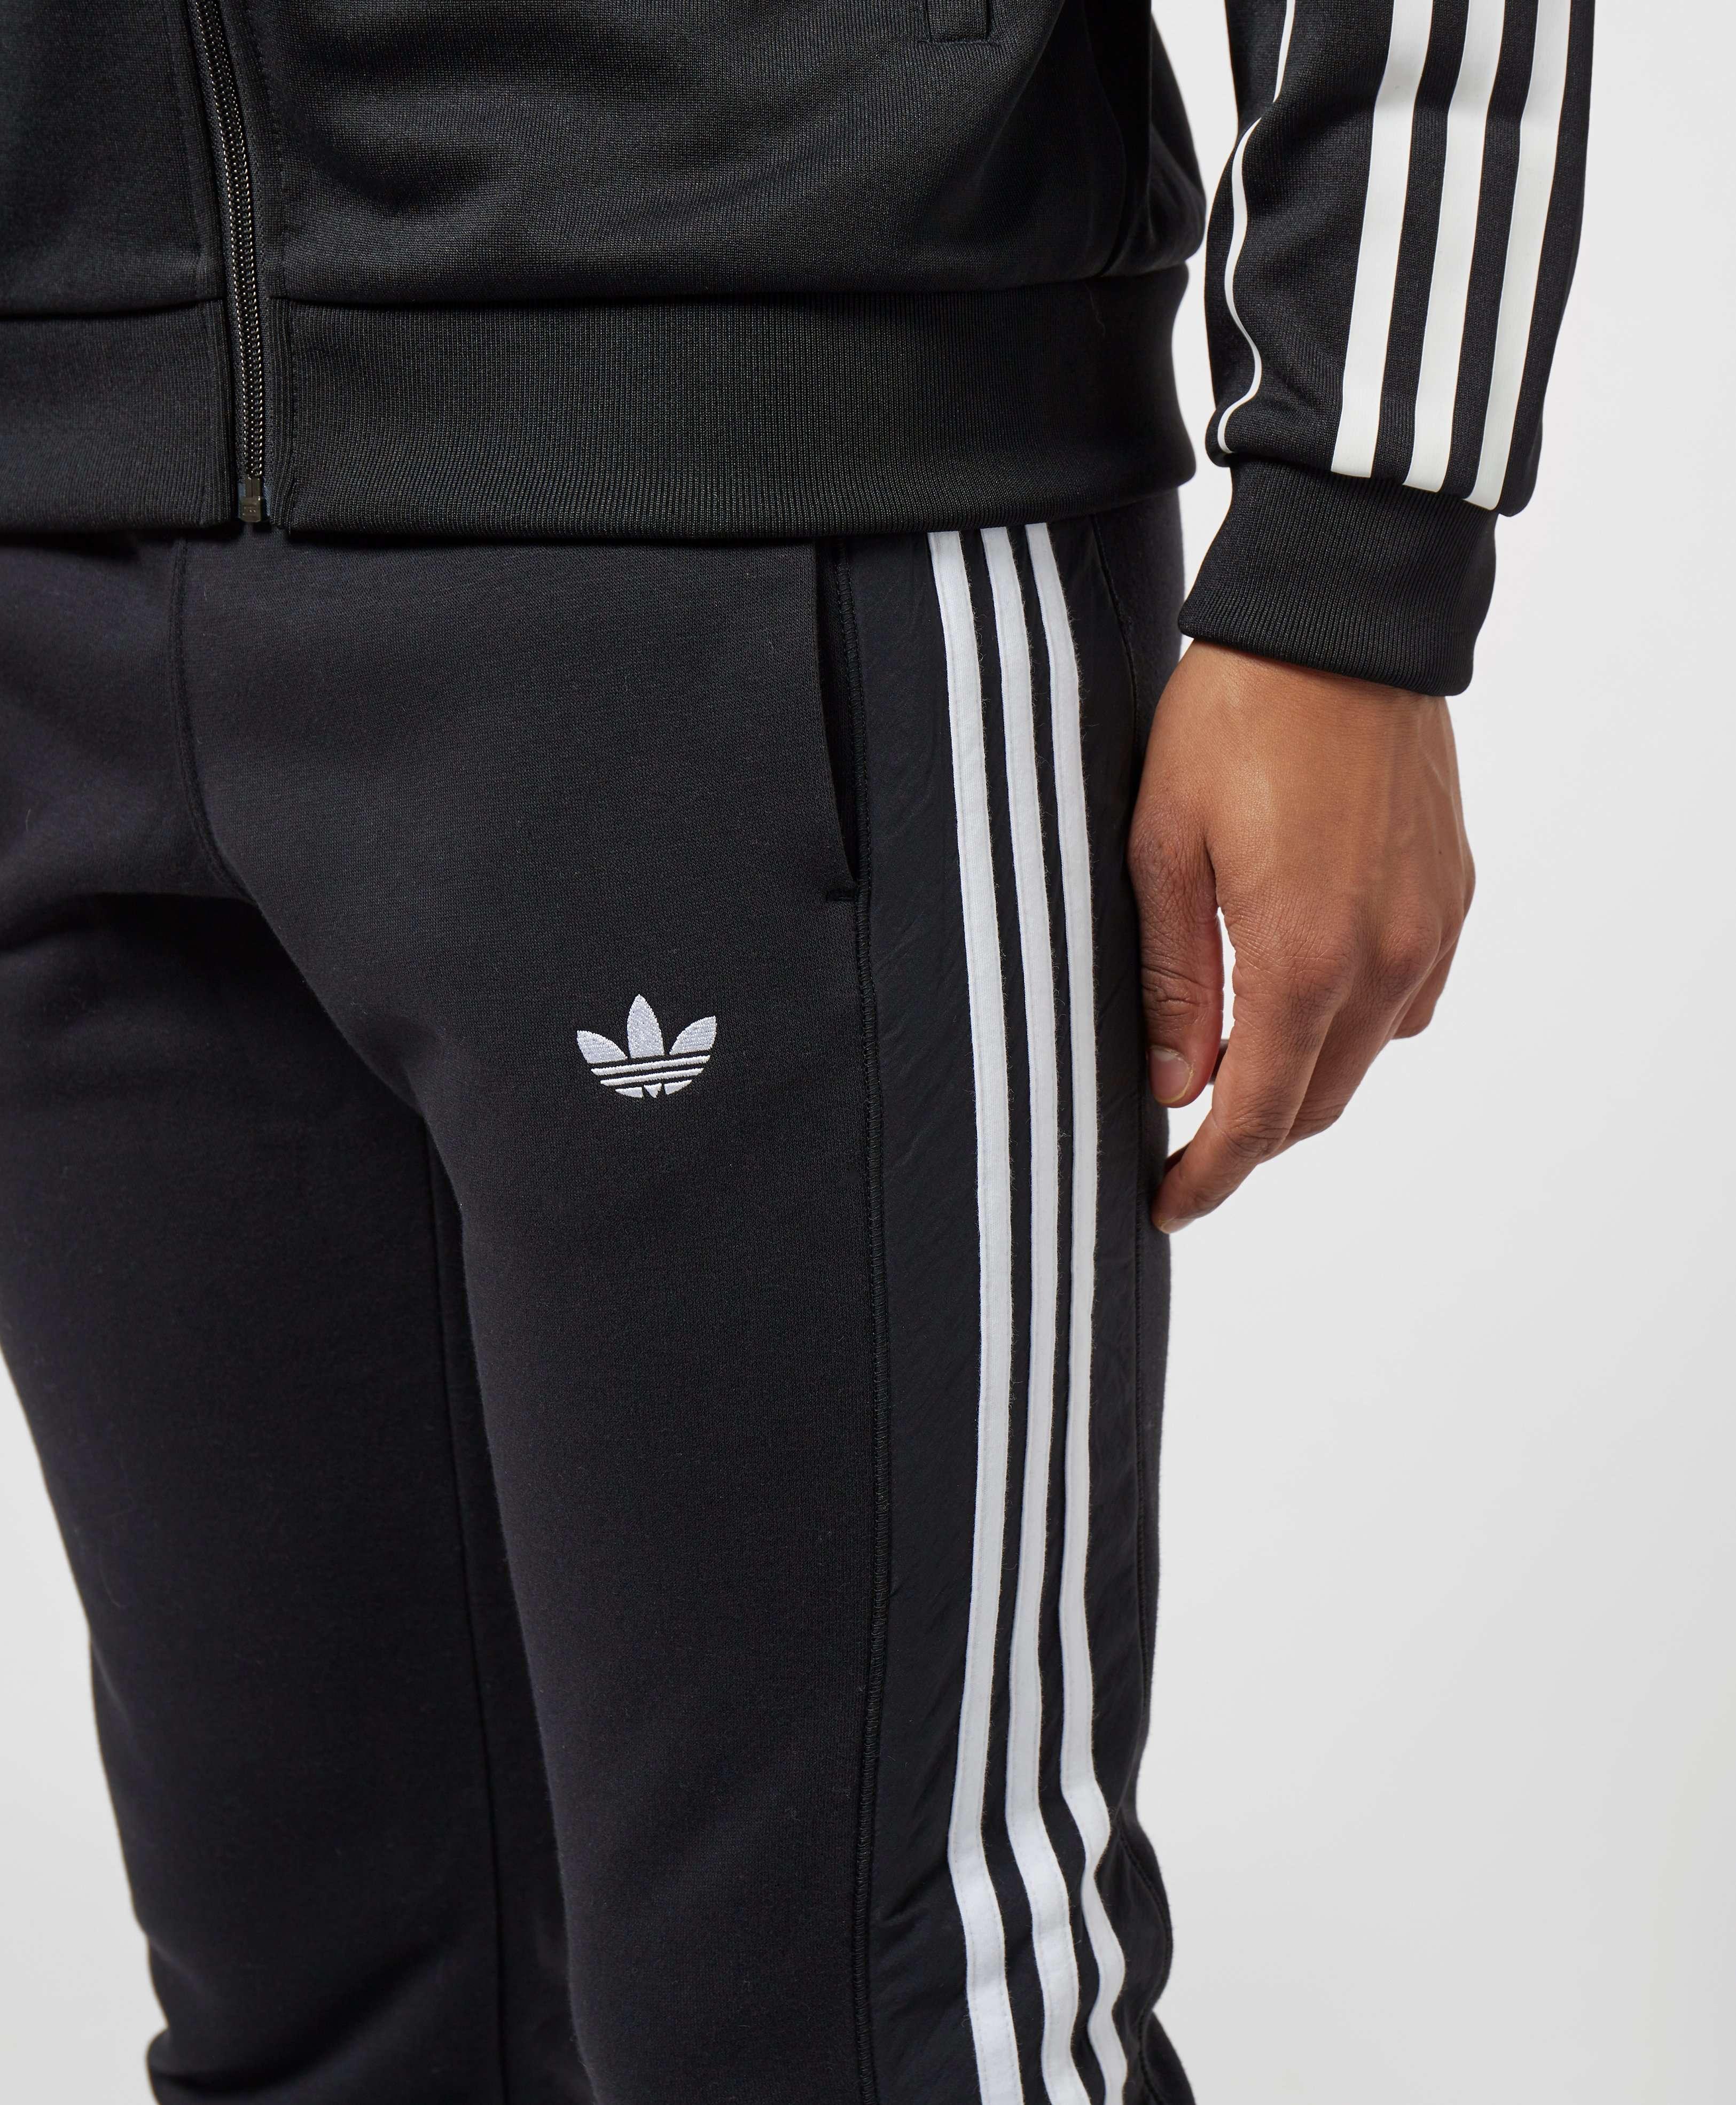 adidas Originals Spirit Cuffed Fleece Pants